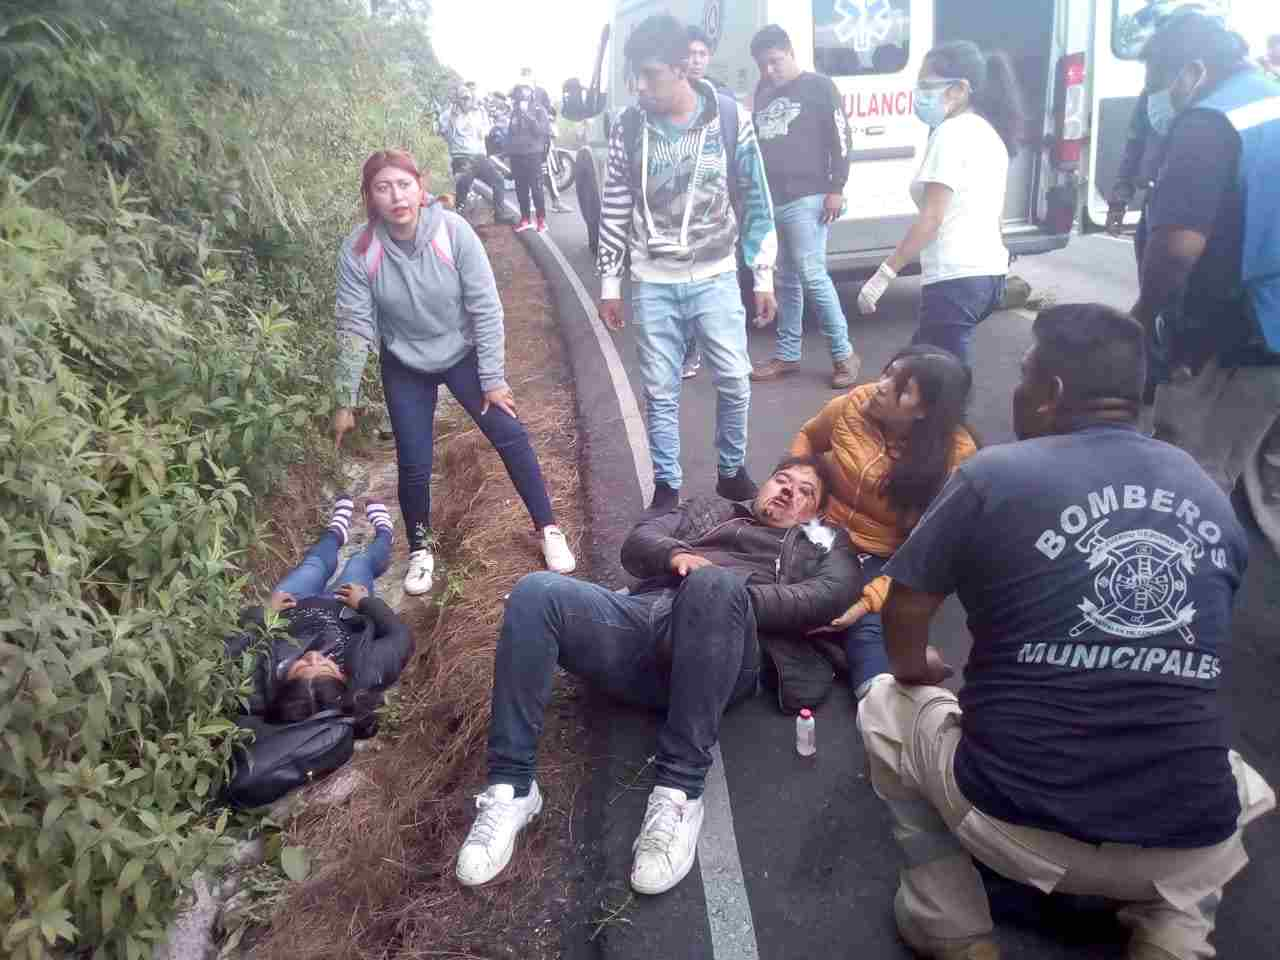 DERRAPAN MOTOCICLISTAS EN CALCAHUALCO